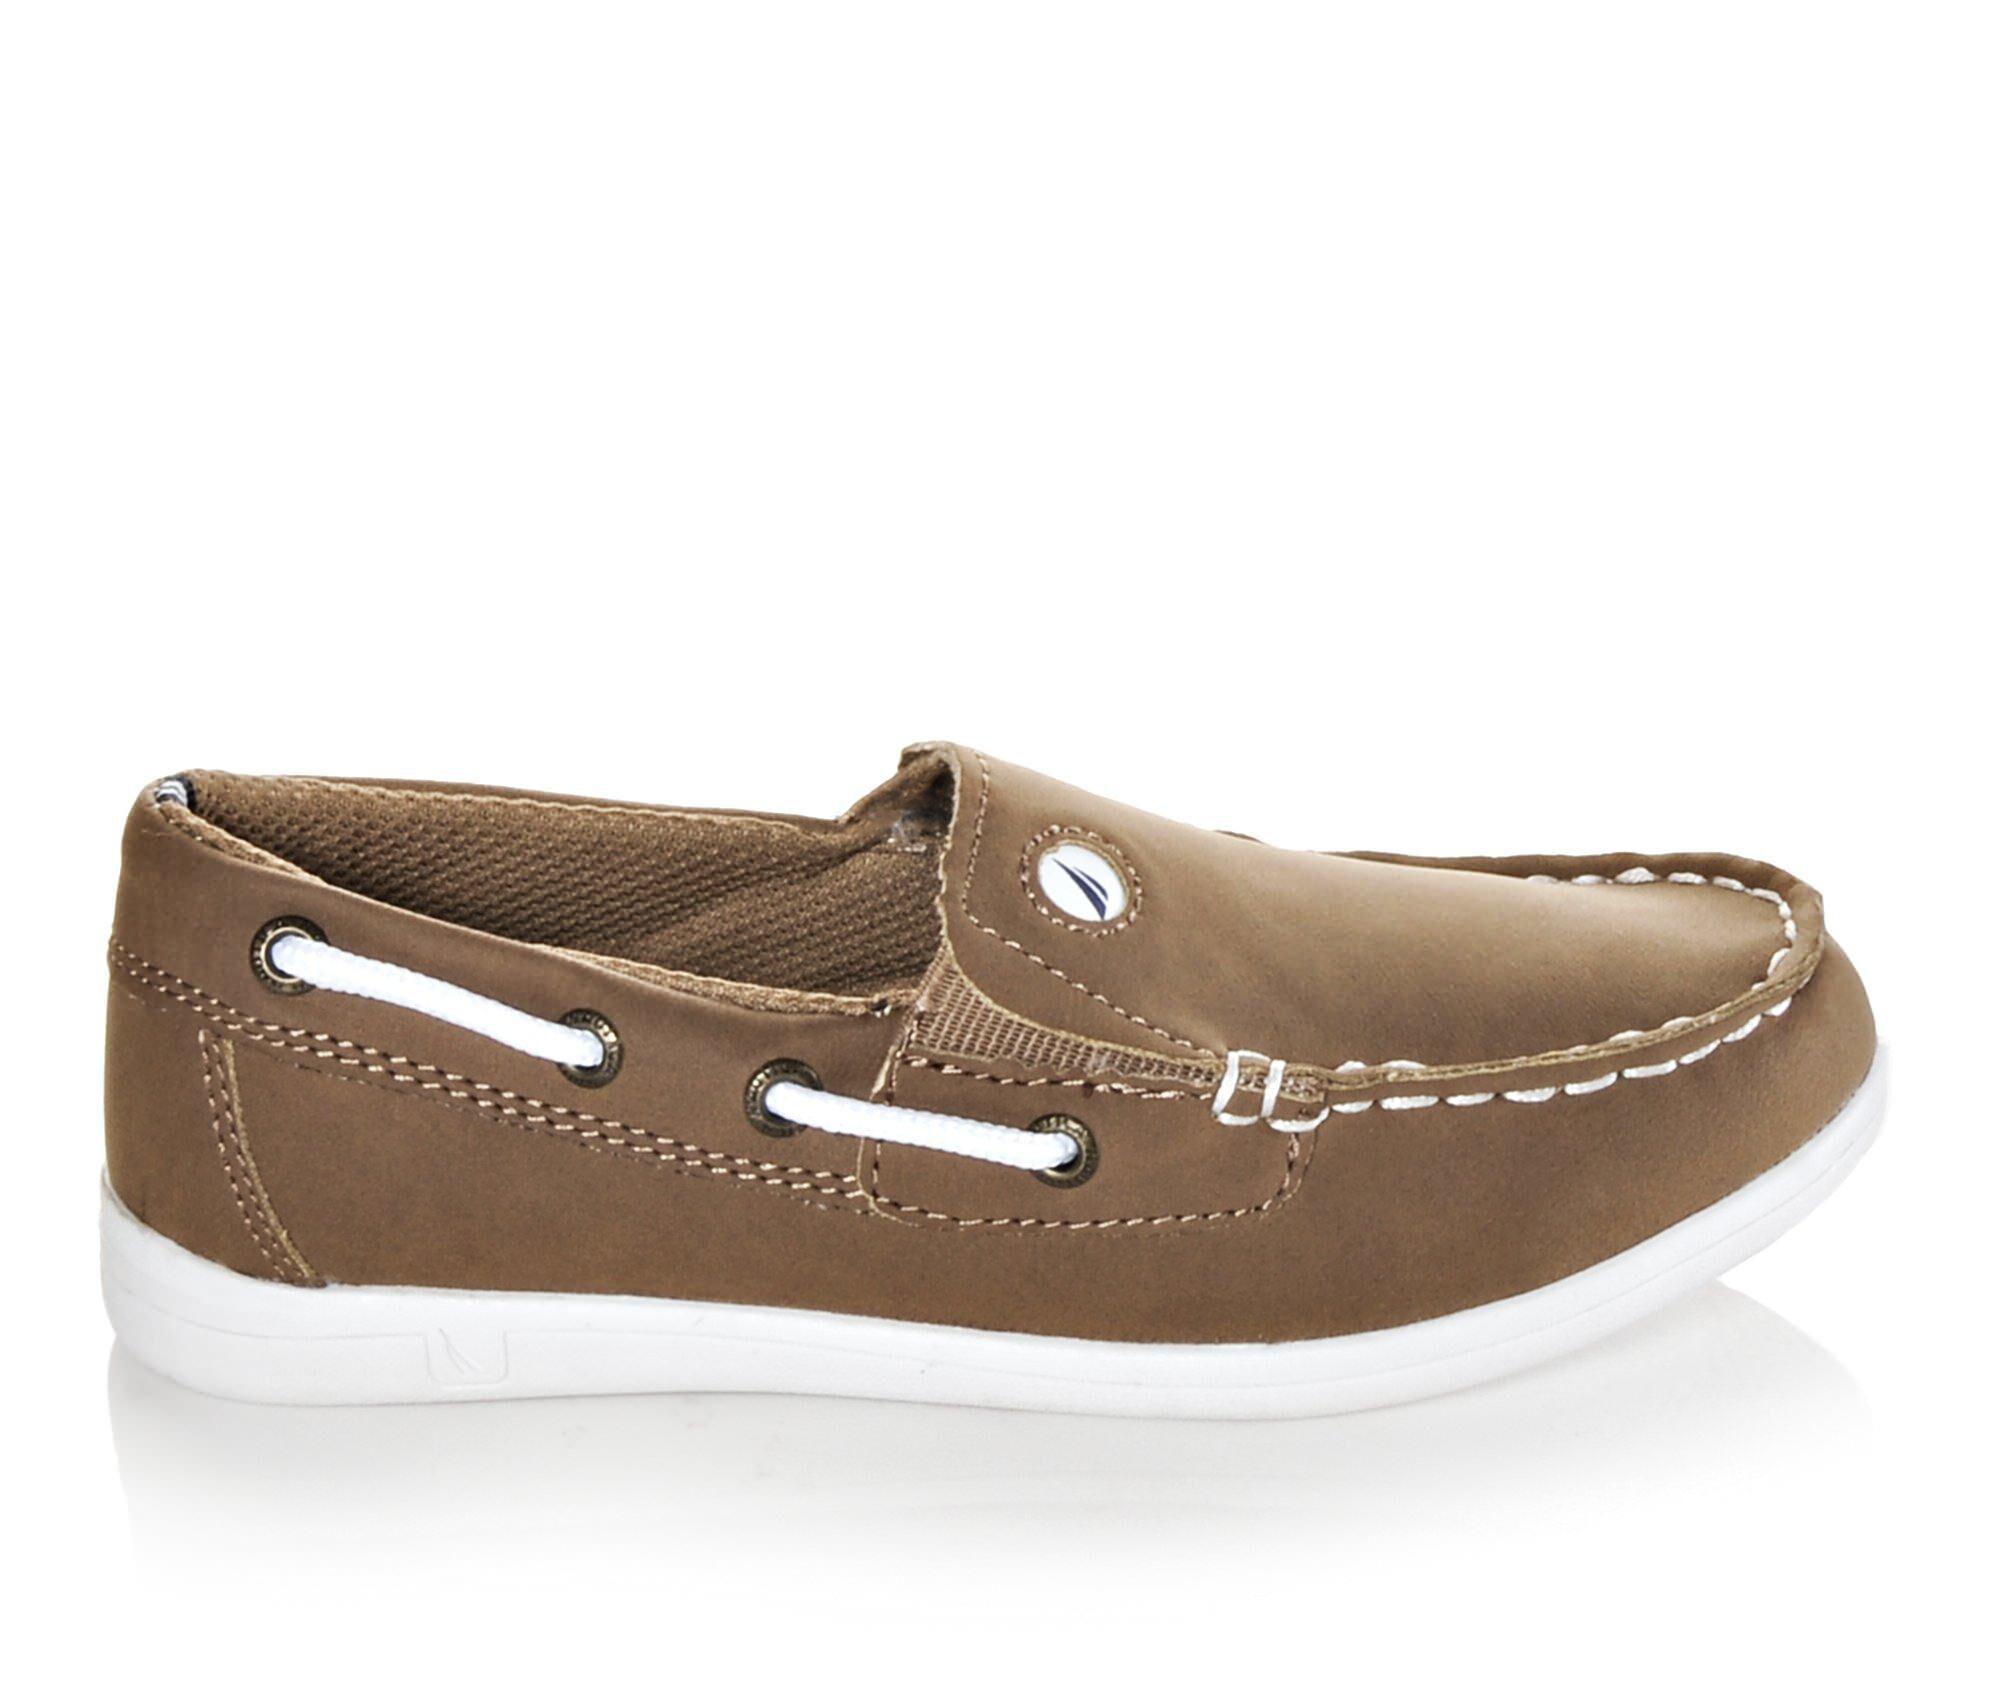 Nautica Shoes Nautica Plymouth 13 6 Boys Casual Shoes Tan